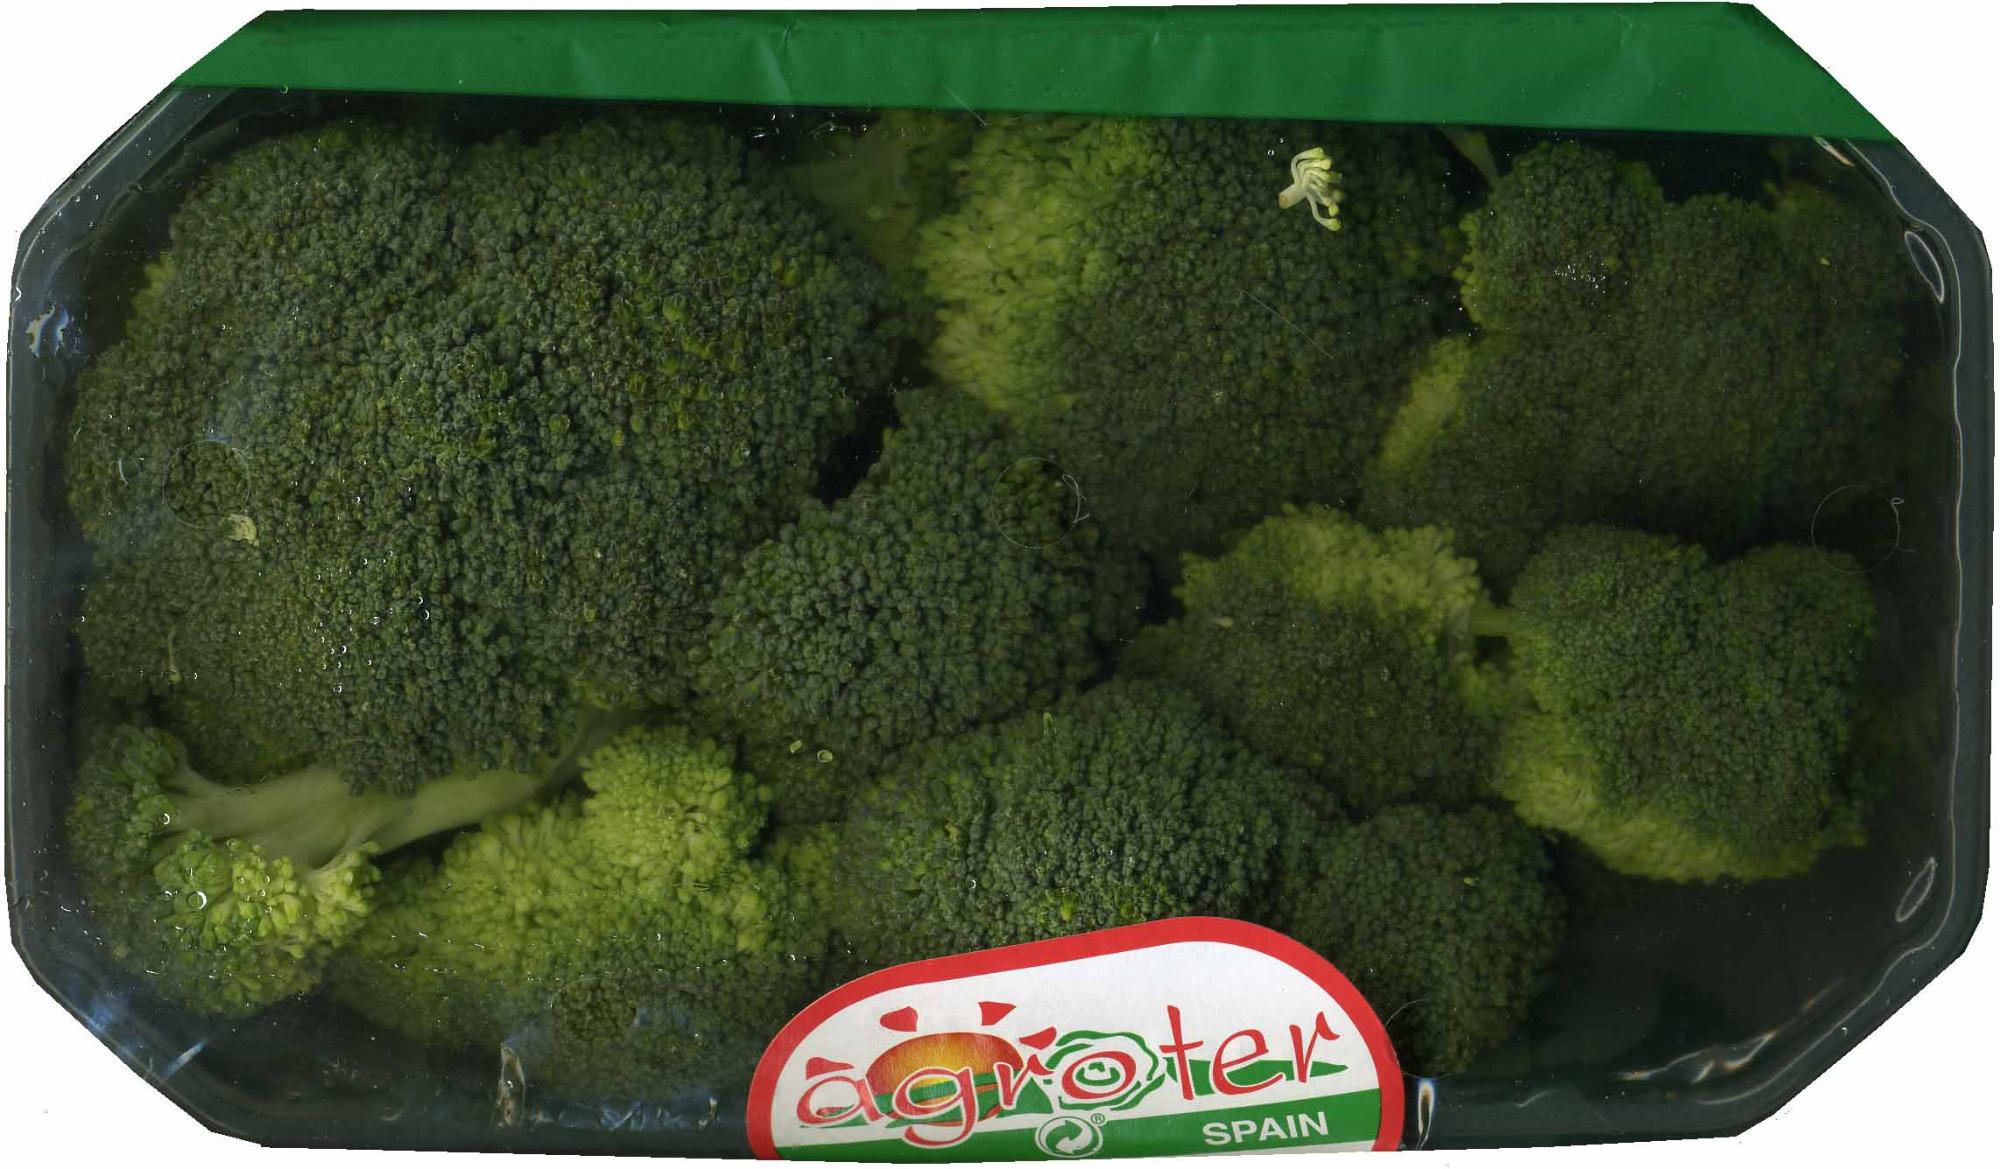 Floretes de brócoli - Product - es